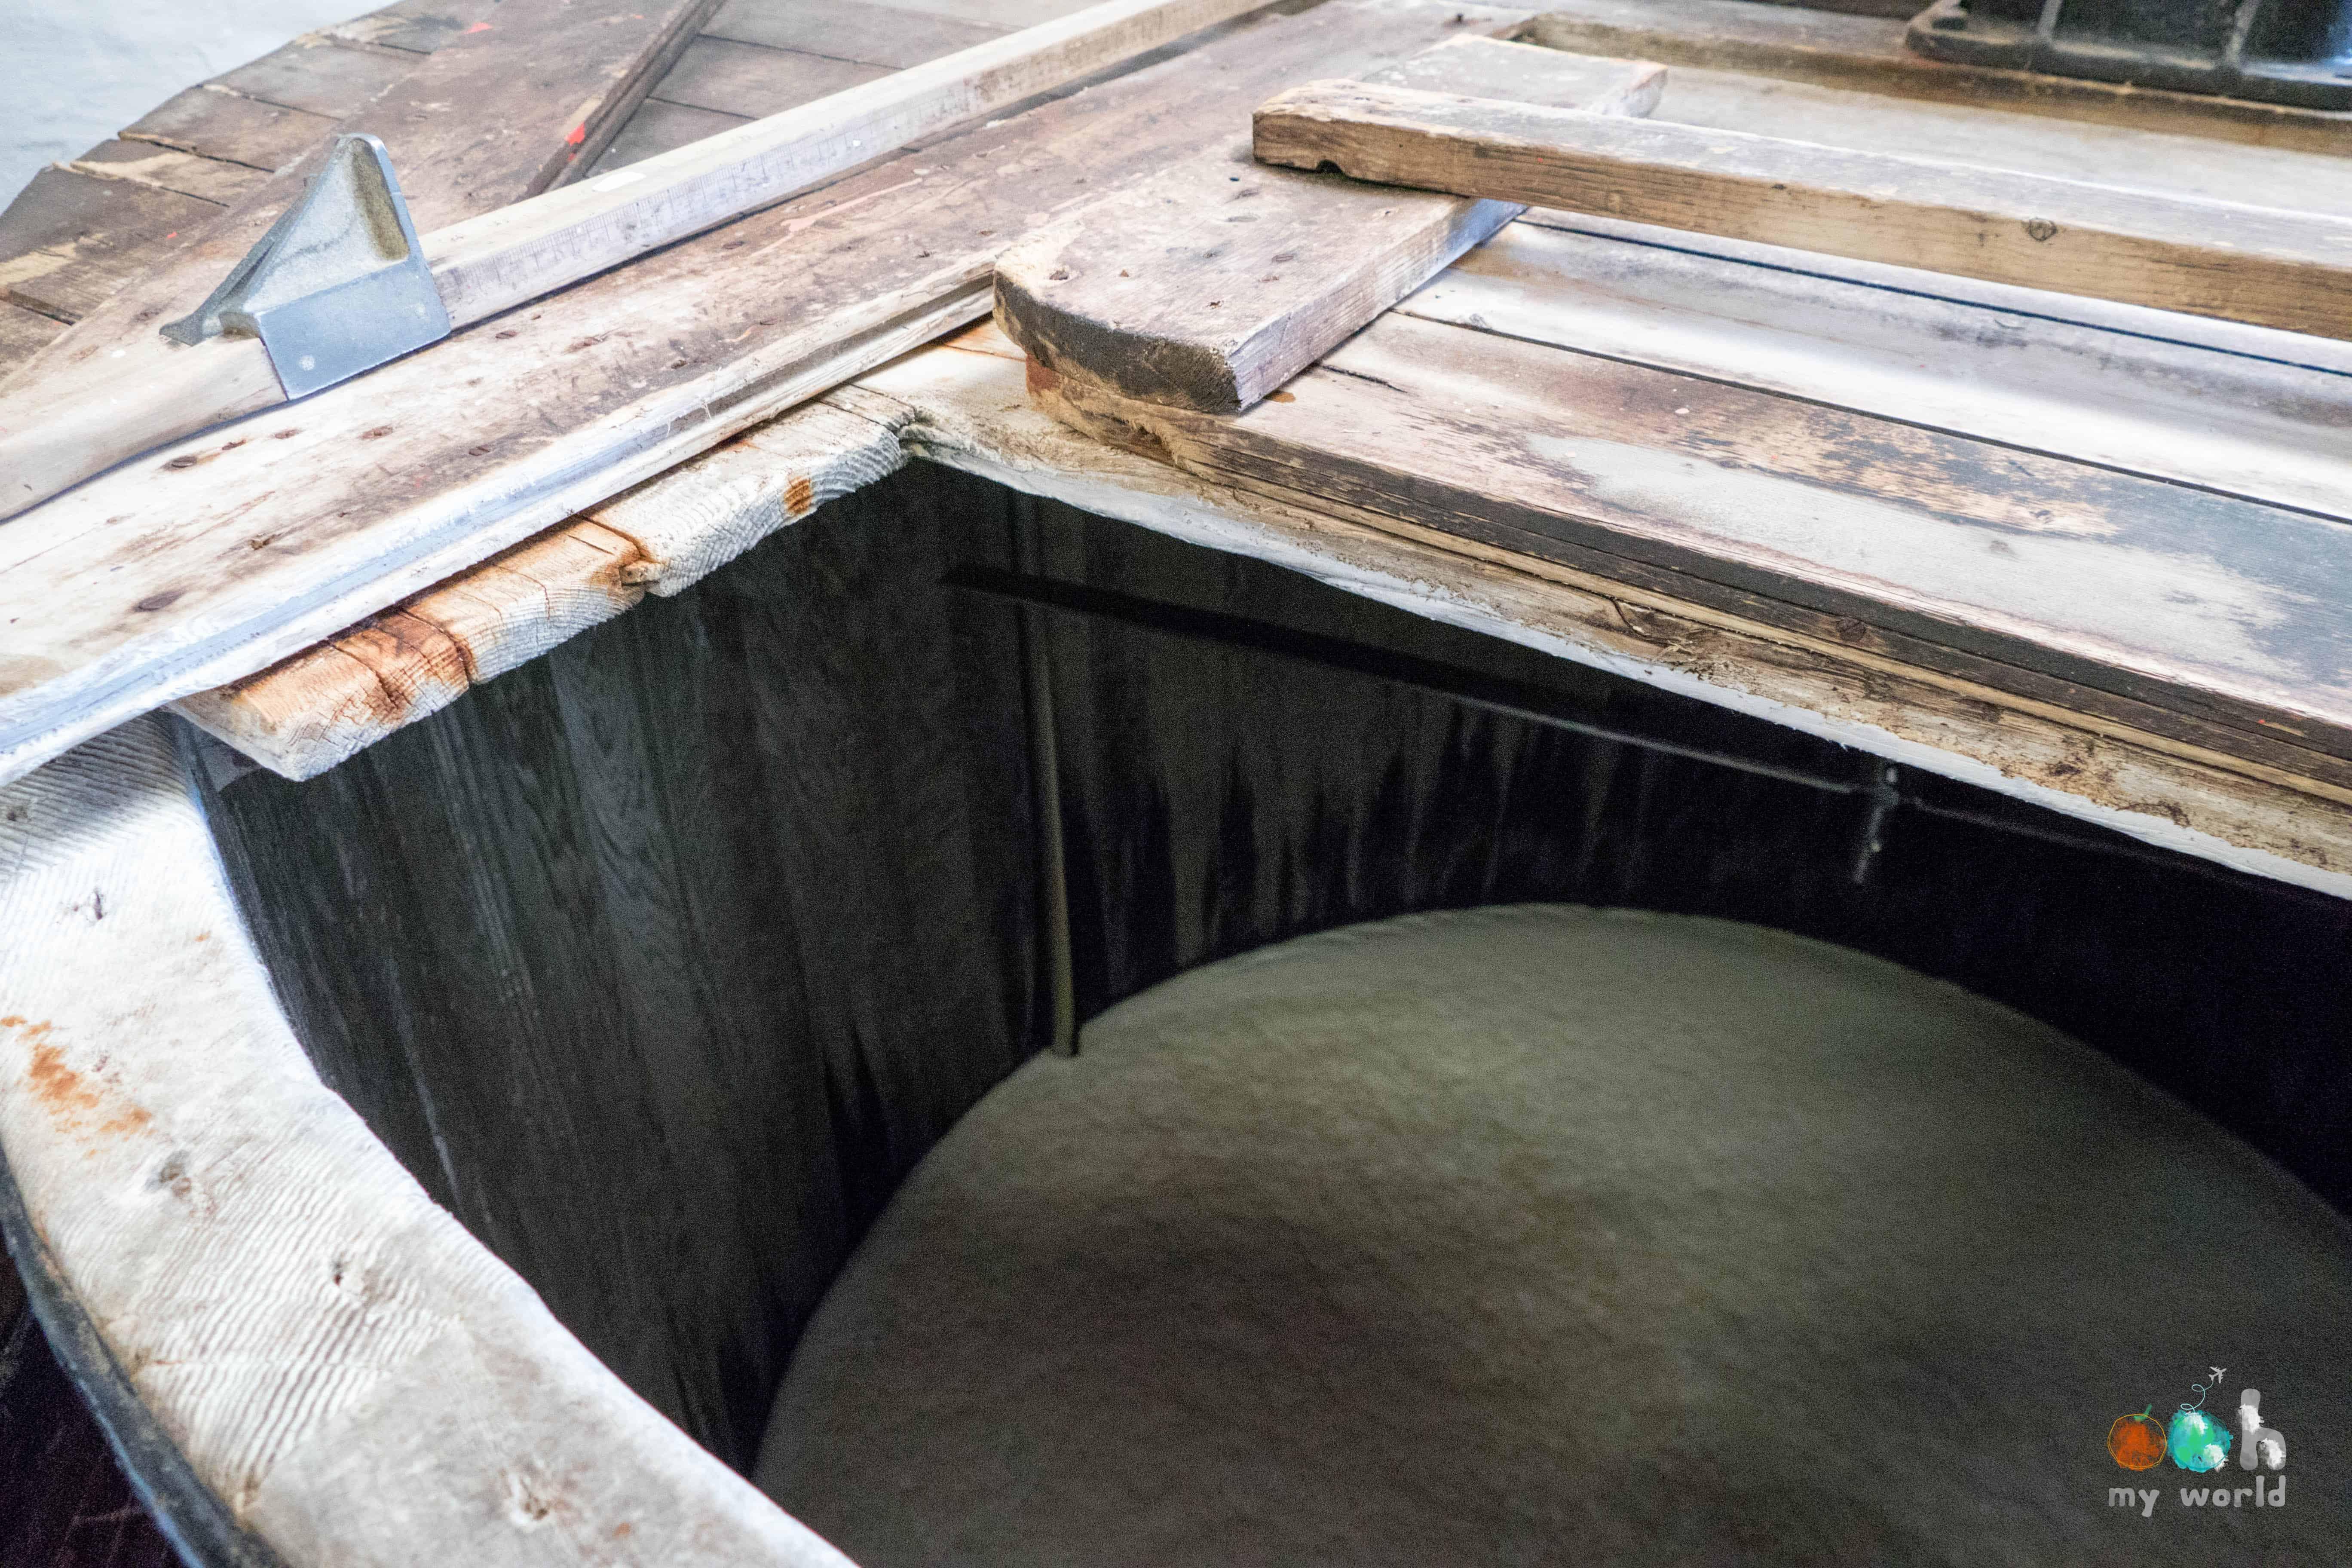 Mash tun de la distillerie d'Edradour